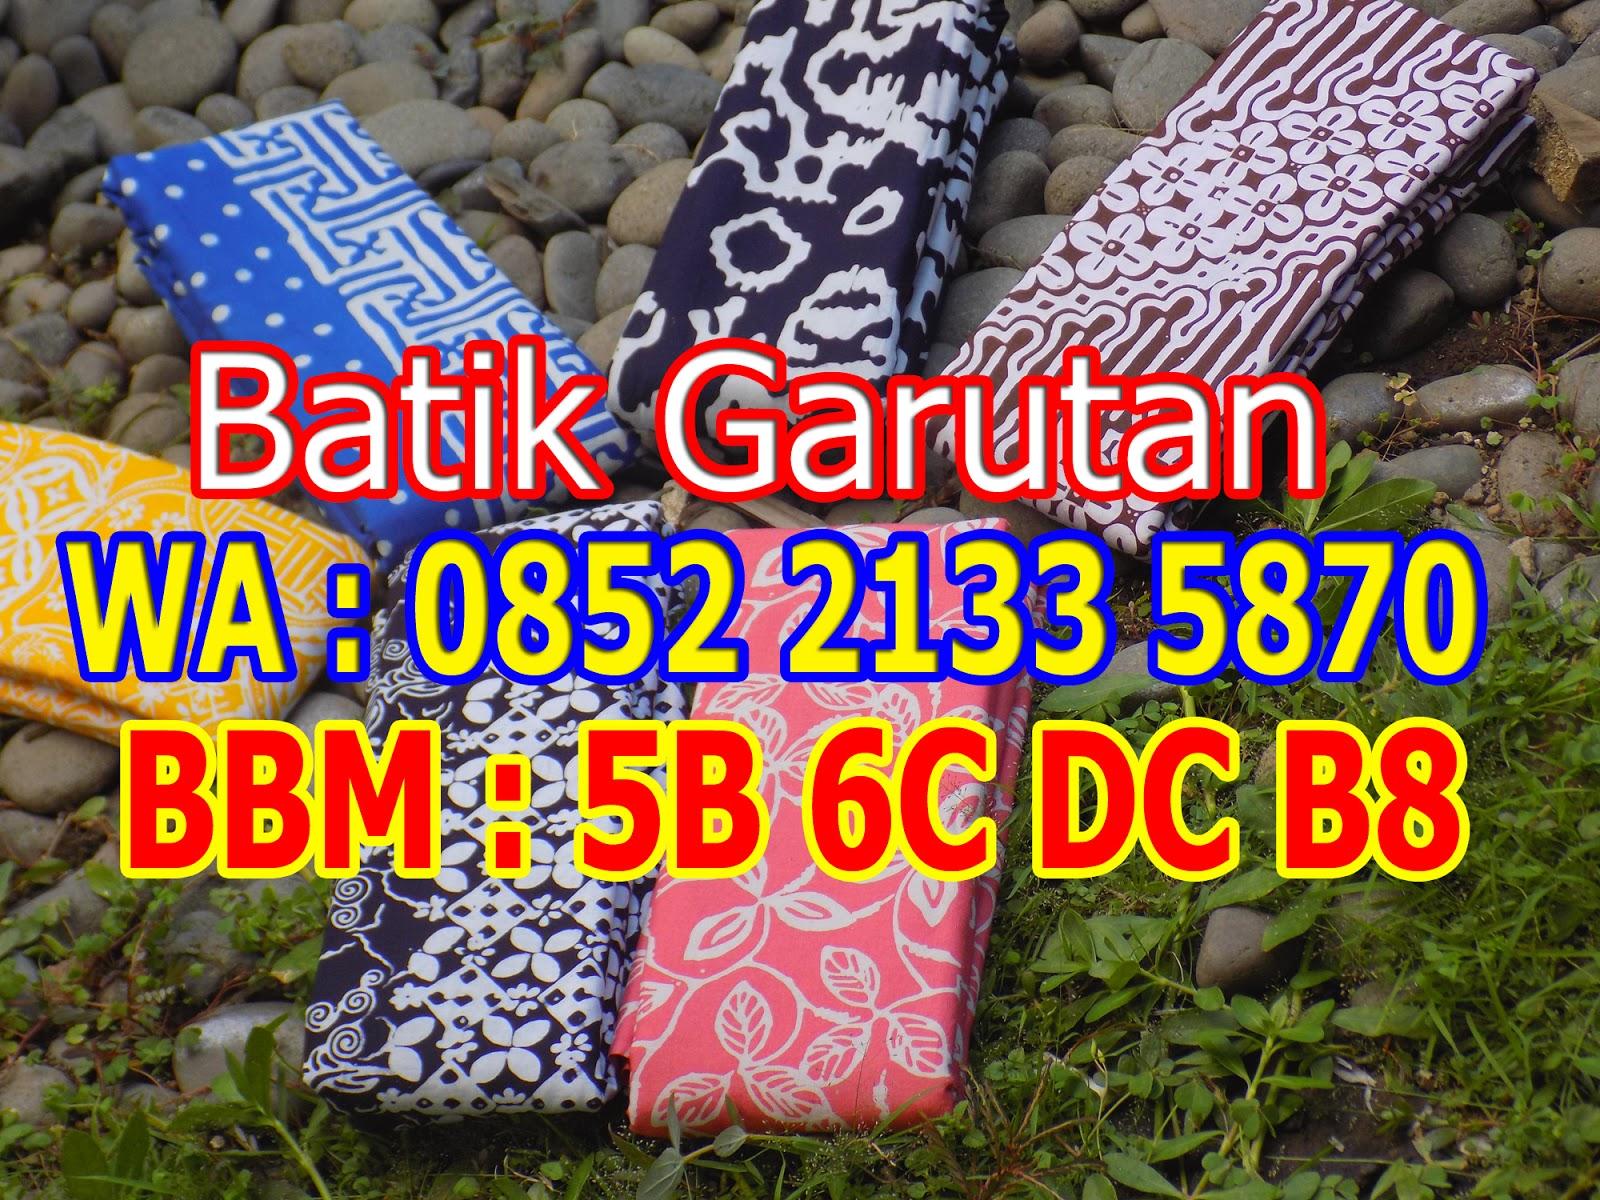 ... Garut MurahBatik Garut, Batik Garutan, WA 0852 2133 5870 Batik Tulis